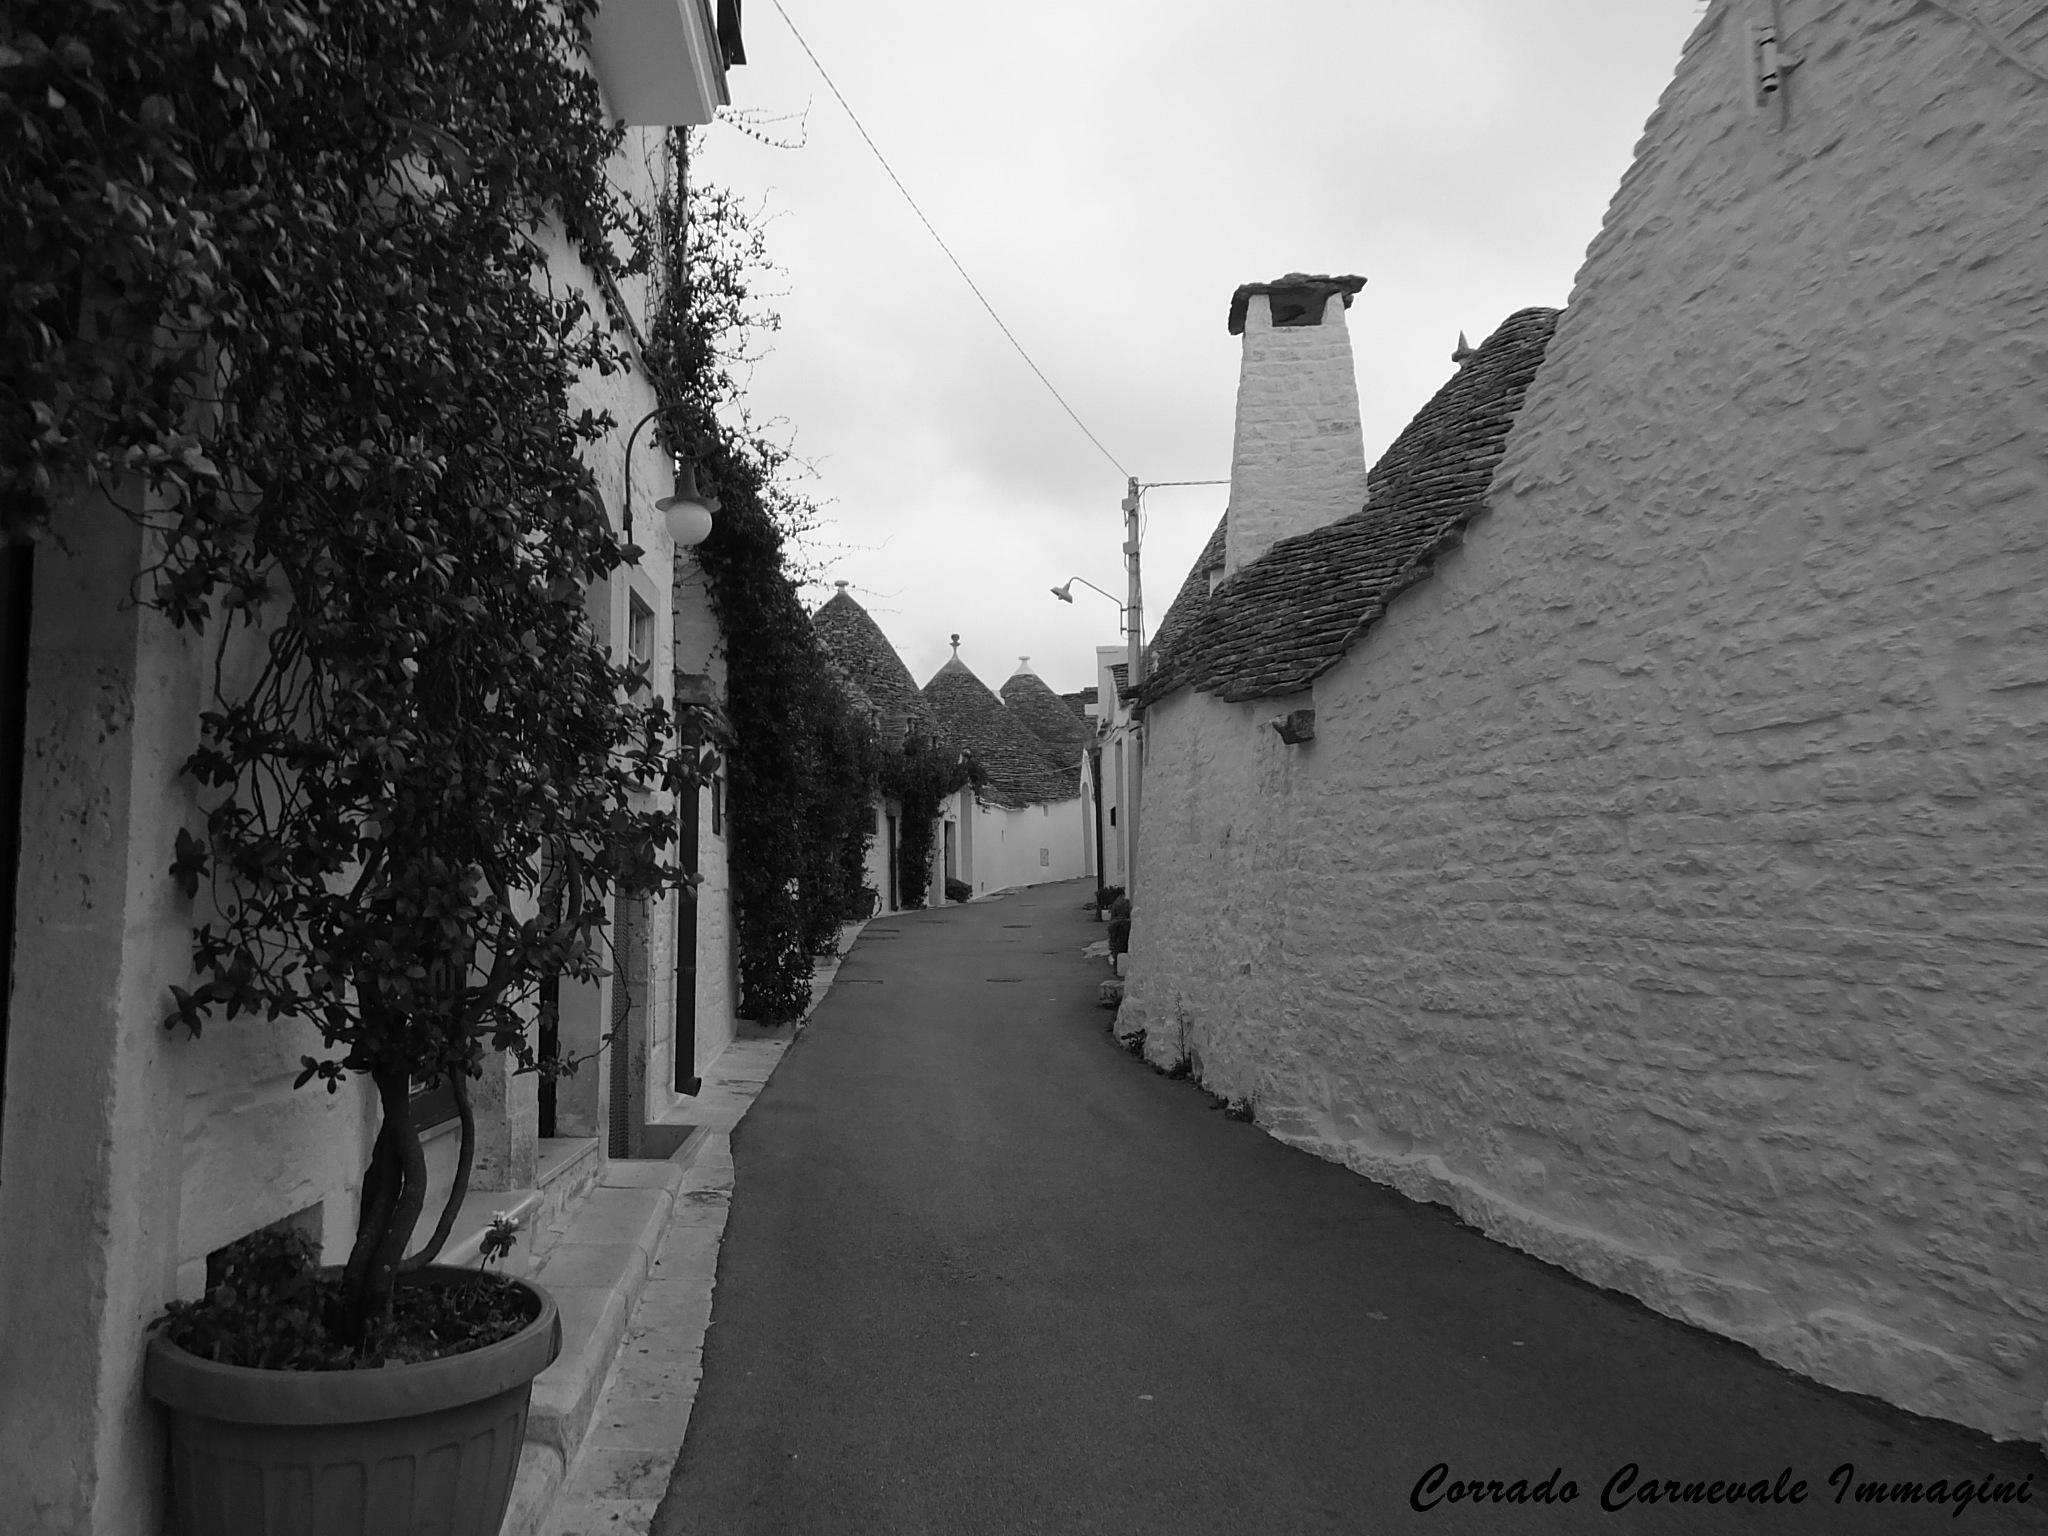 Untitled by corrado carnevale